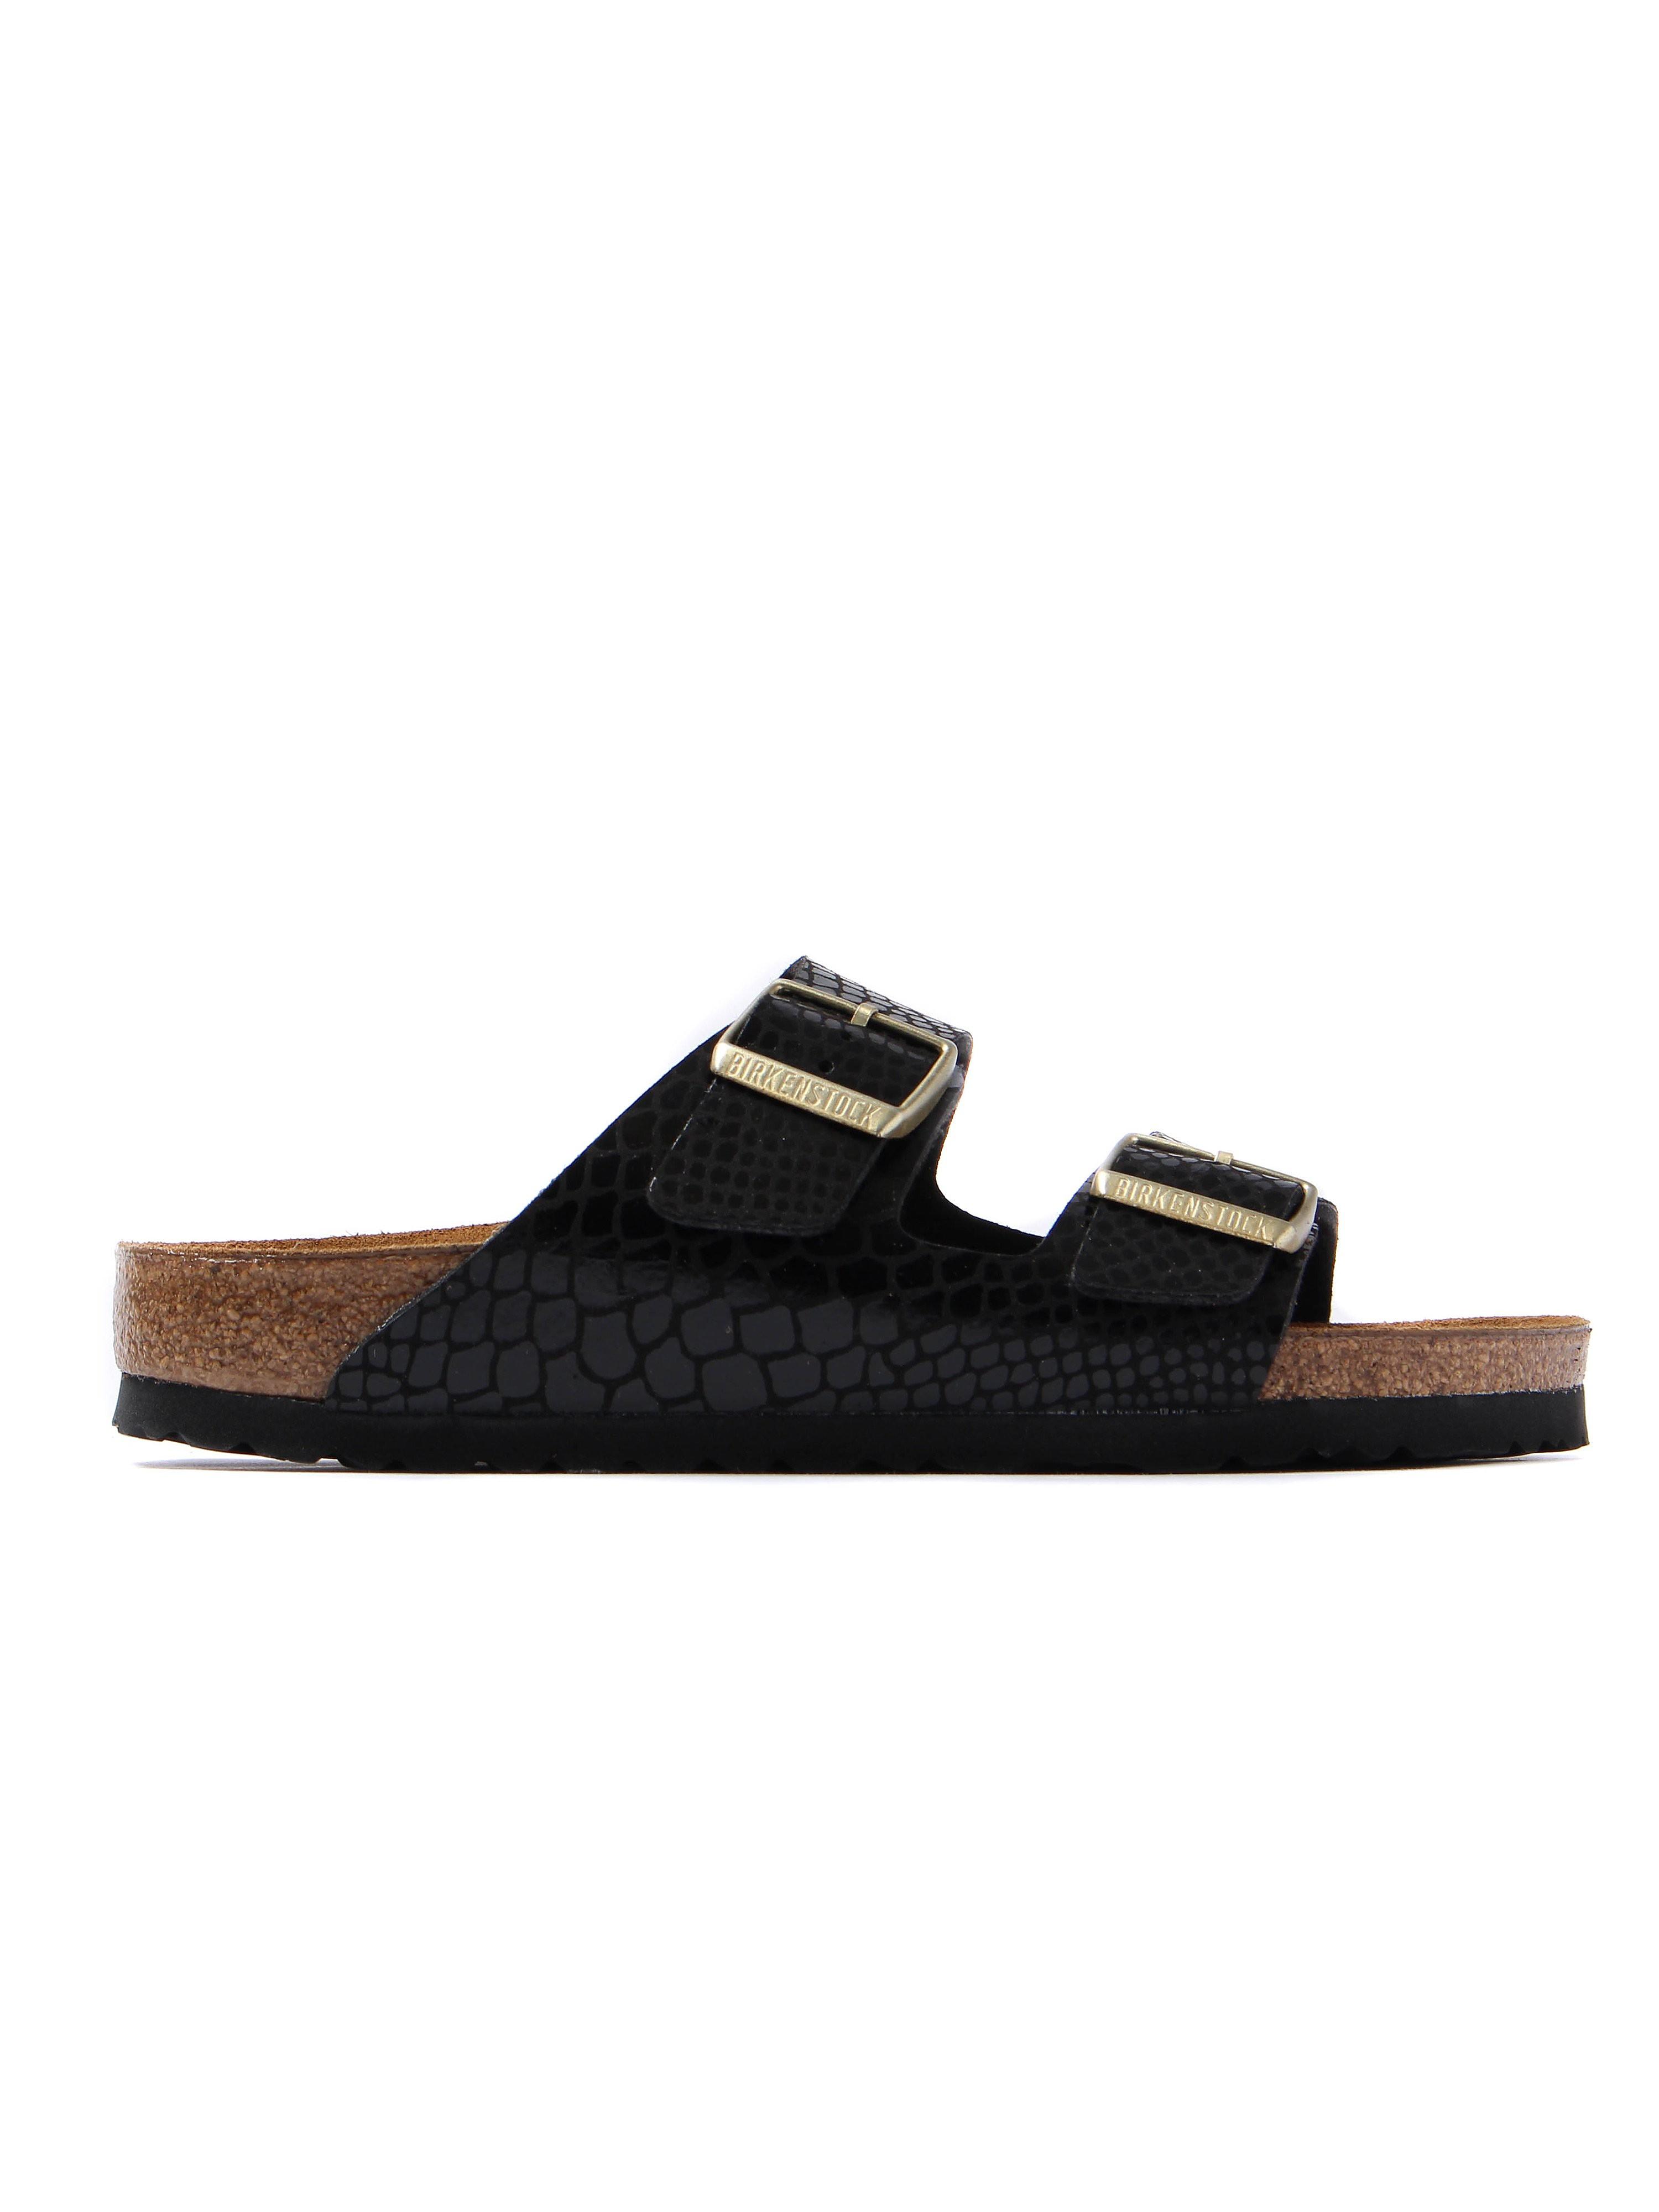 Birkenstock Women's Arizona Narrow Fit Sandals - Black Snakeskin